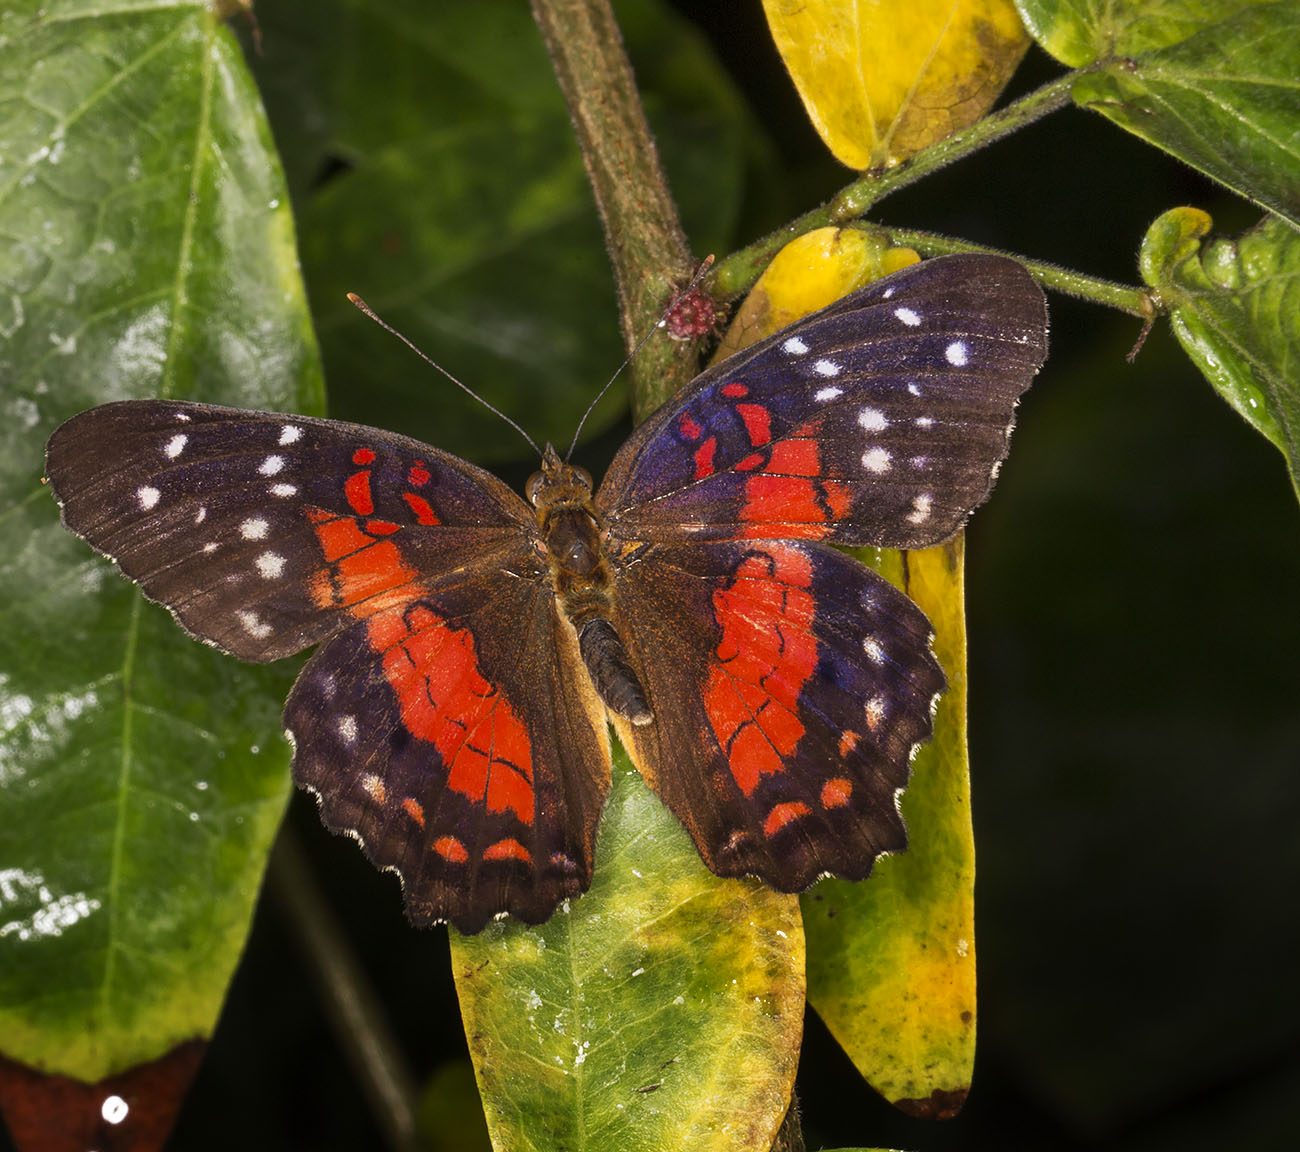 Scarlet Peacock, Anartia amathea.  Wisley Gardens, Butterflies in the Glasshouse, 10 February 2015.